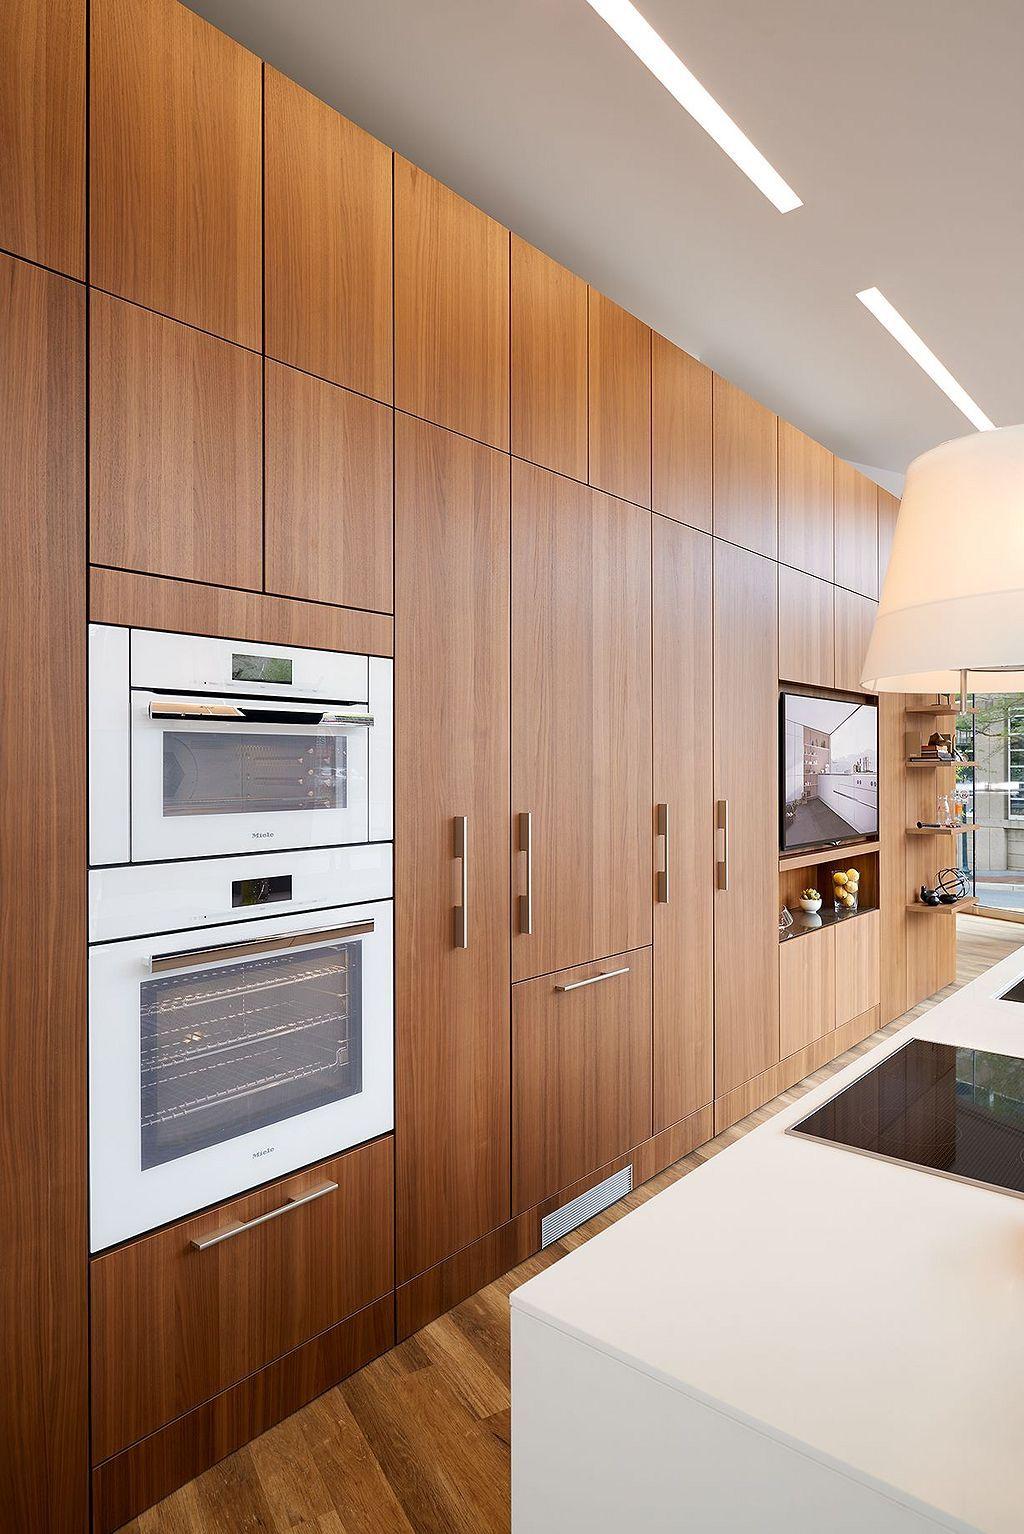 Great 50 Contemporary High End Natural Wood Kitchen Designs Https Hgmagz Com 50 Modern Walnut Kitchen Contemporary Kitchen Cabinets Walnut Kitchen Cabinets